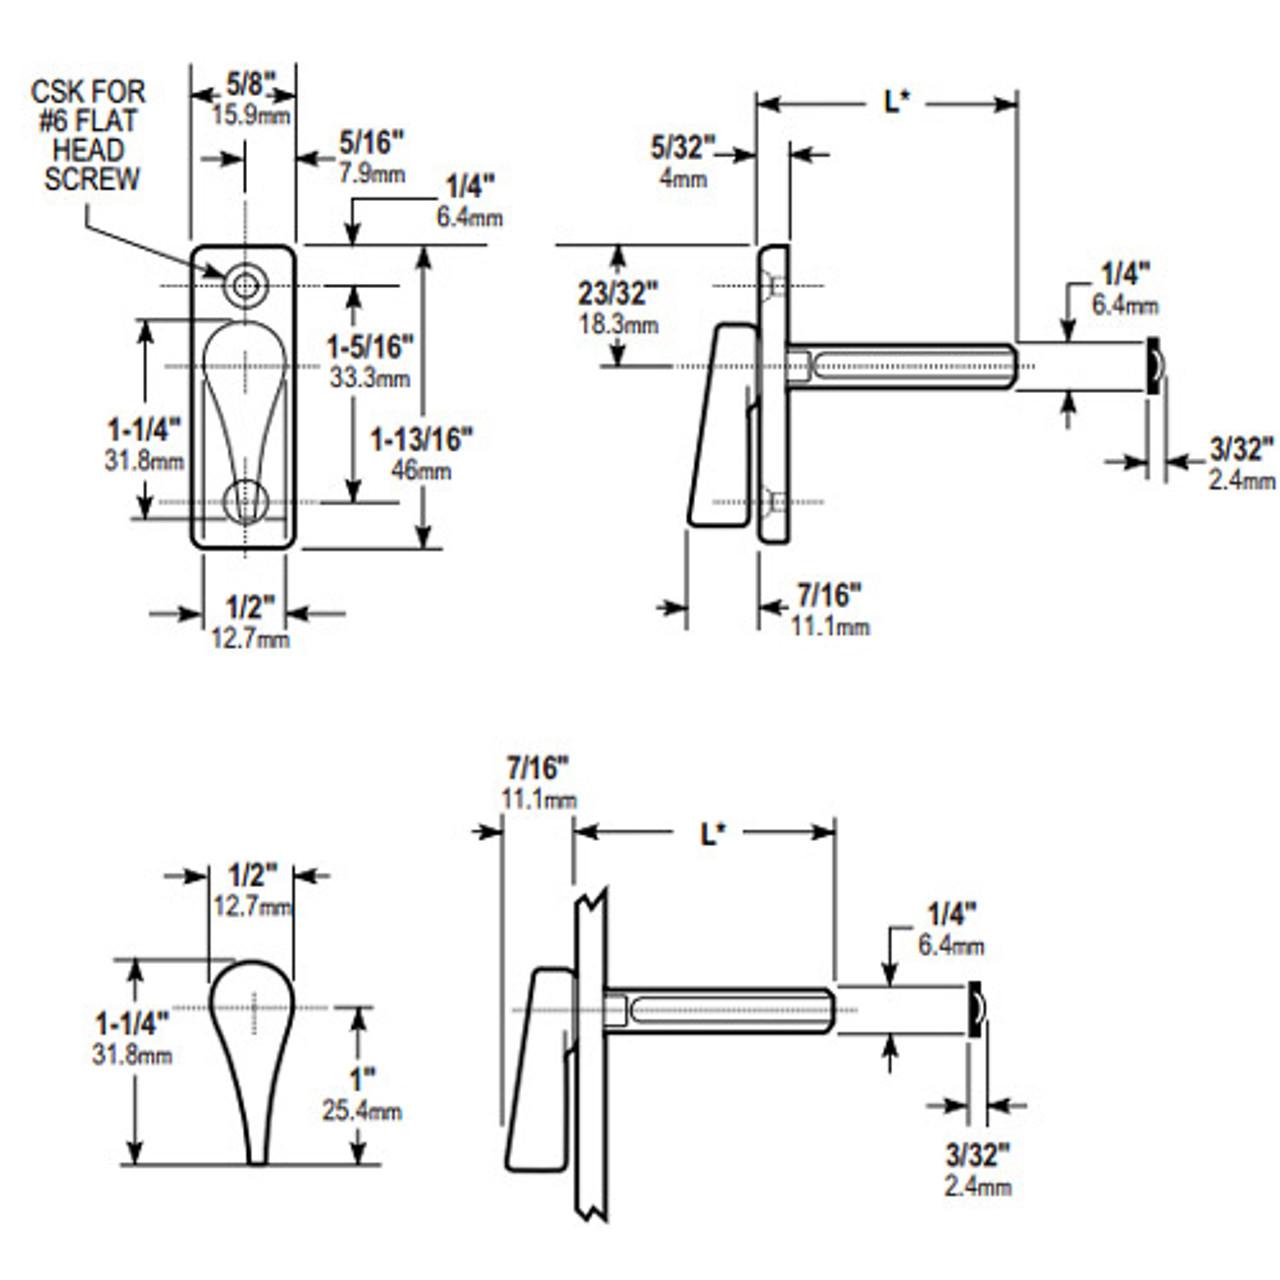 1000-02-13-119 Adams Rite 1000 Series Turns Dimensional View